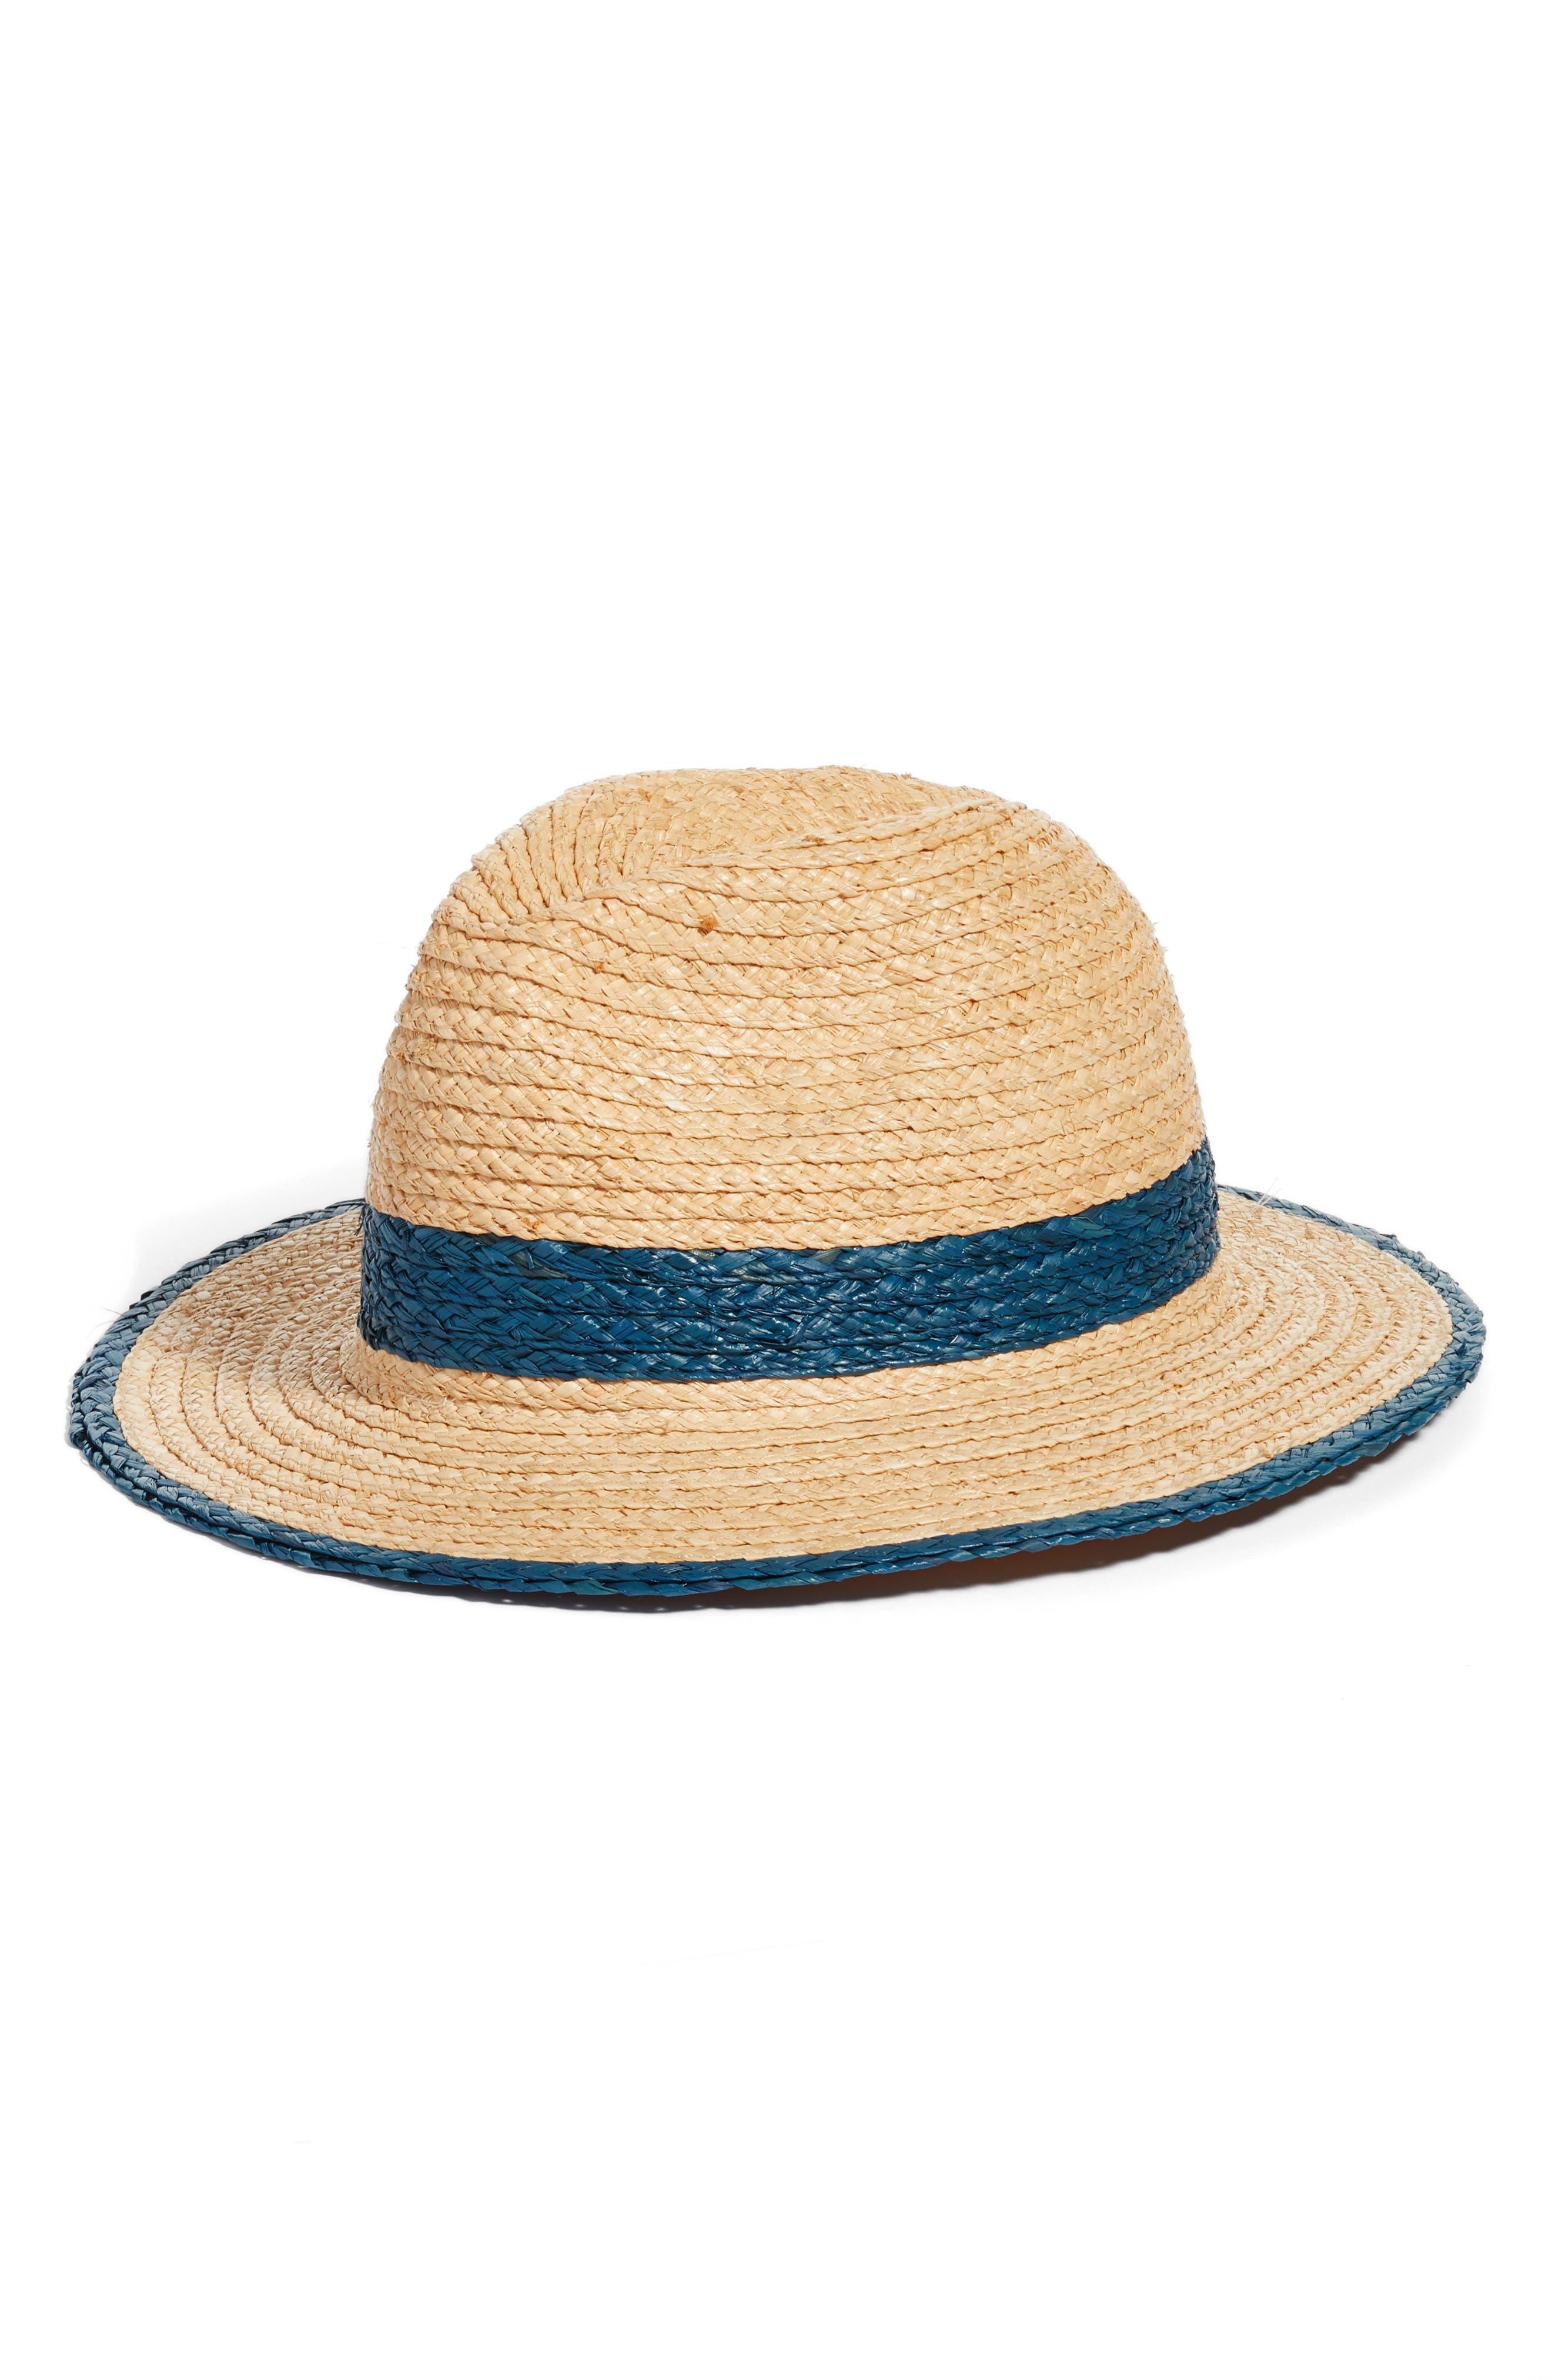 Contrast Trim Straw Panama Hat,                         Main,                         color, 260